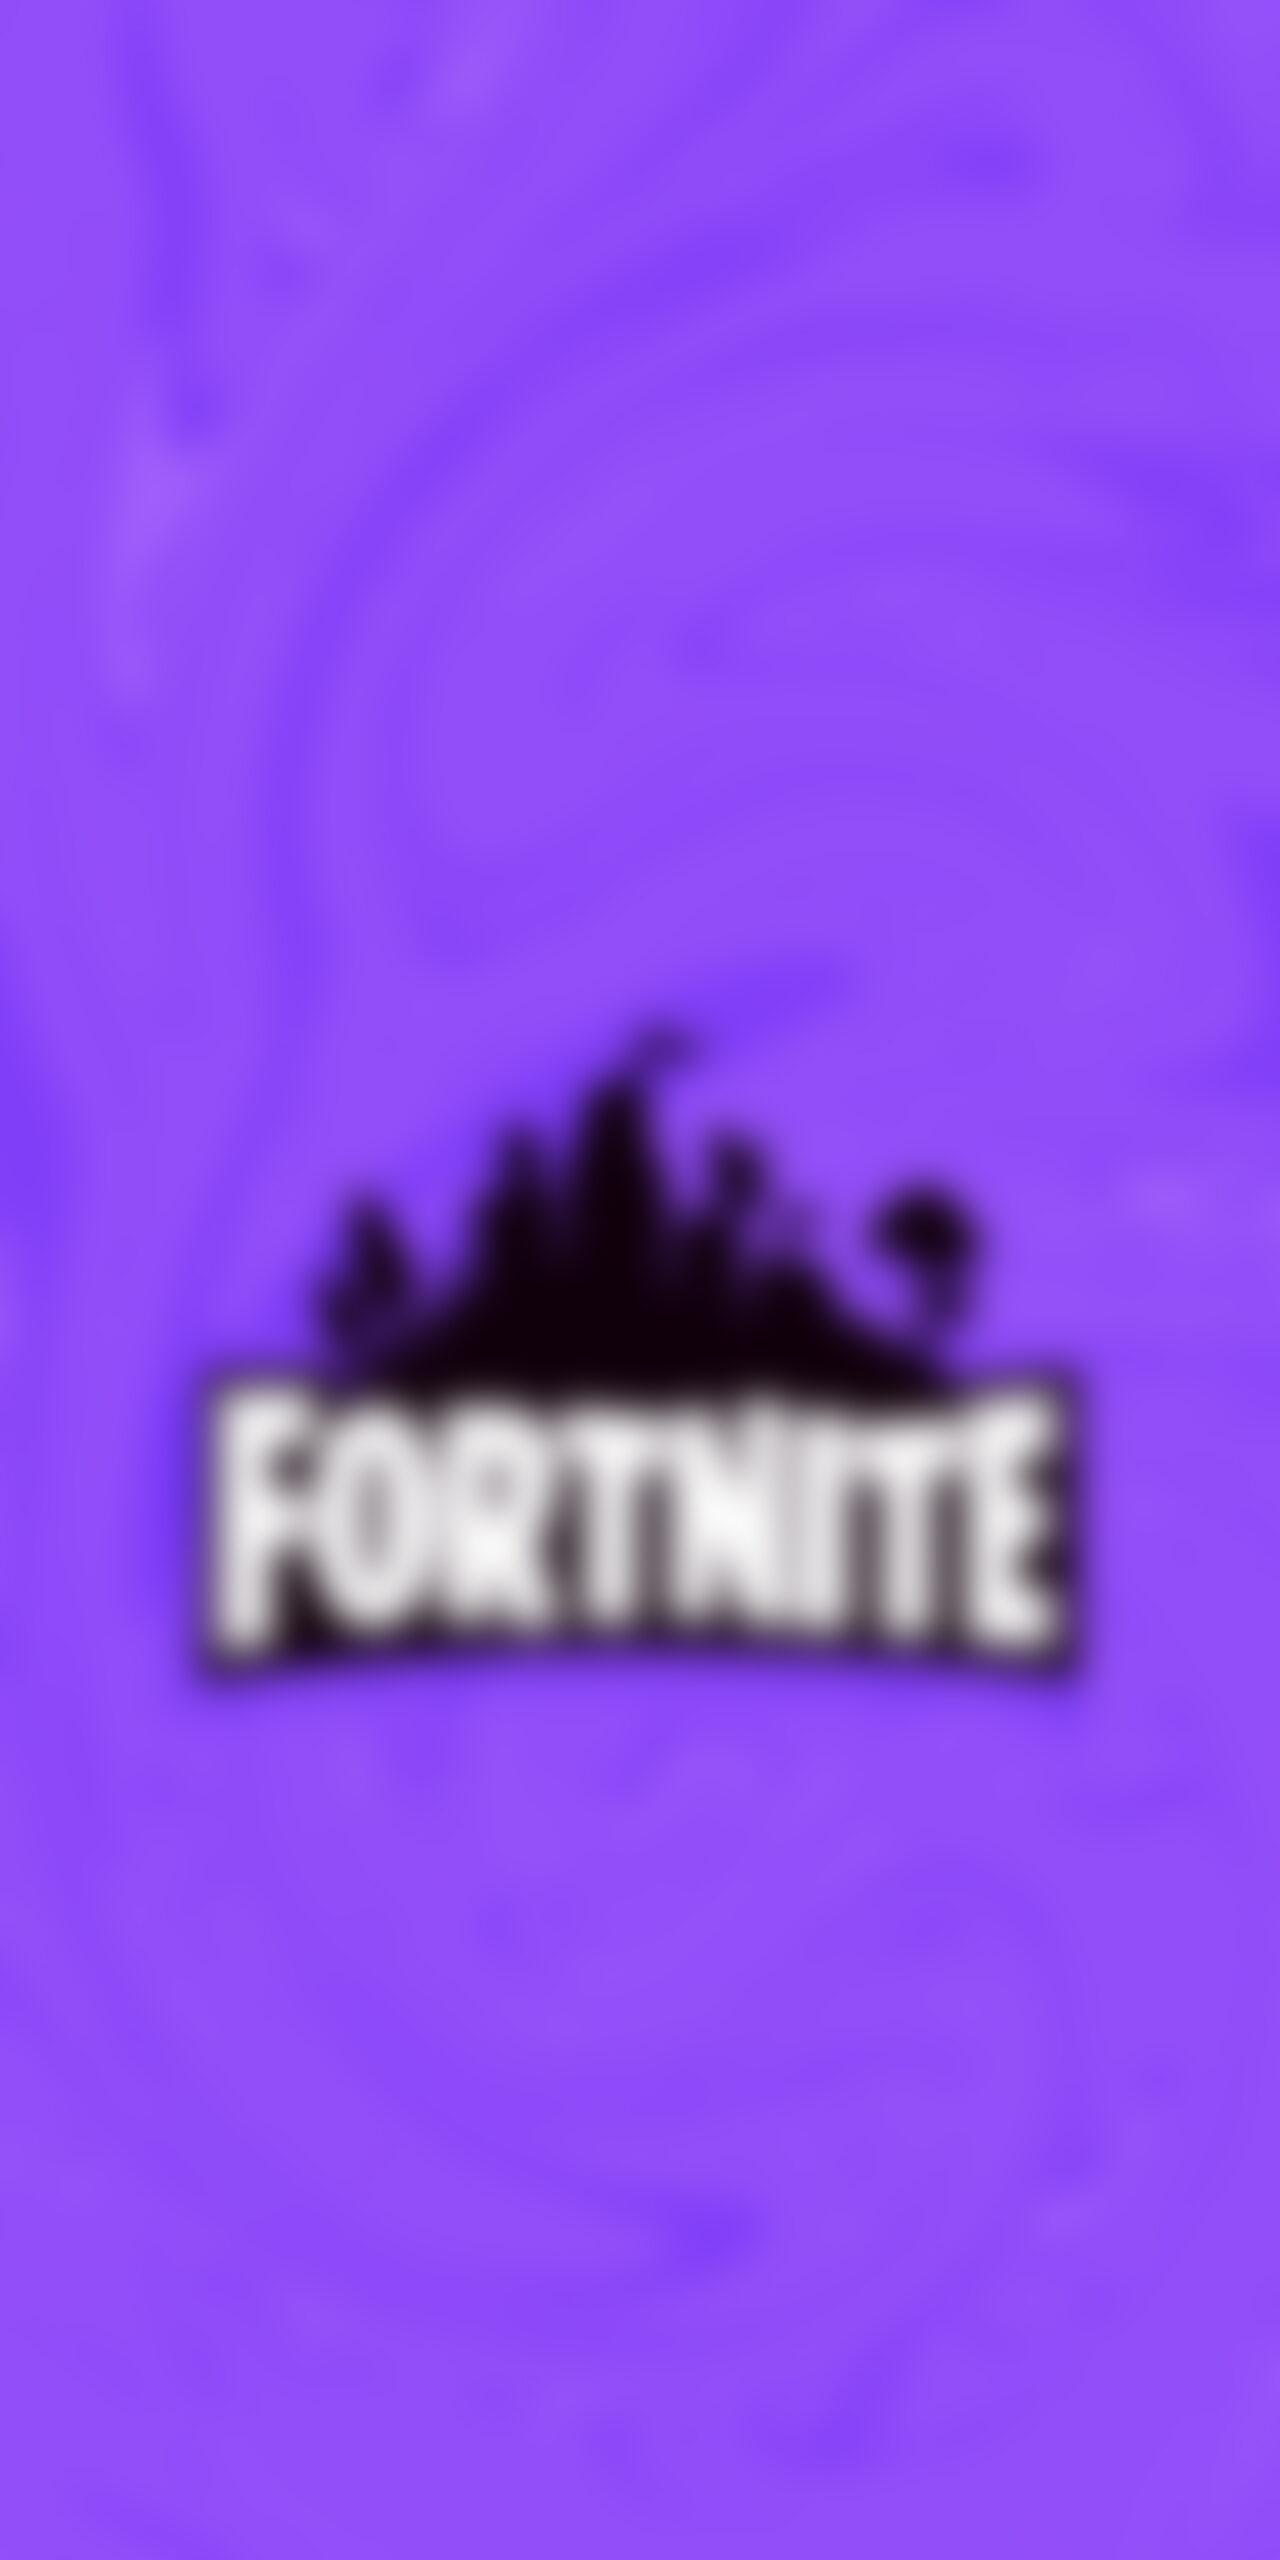 fortnite logo purple blur wallpaper